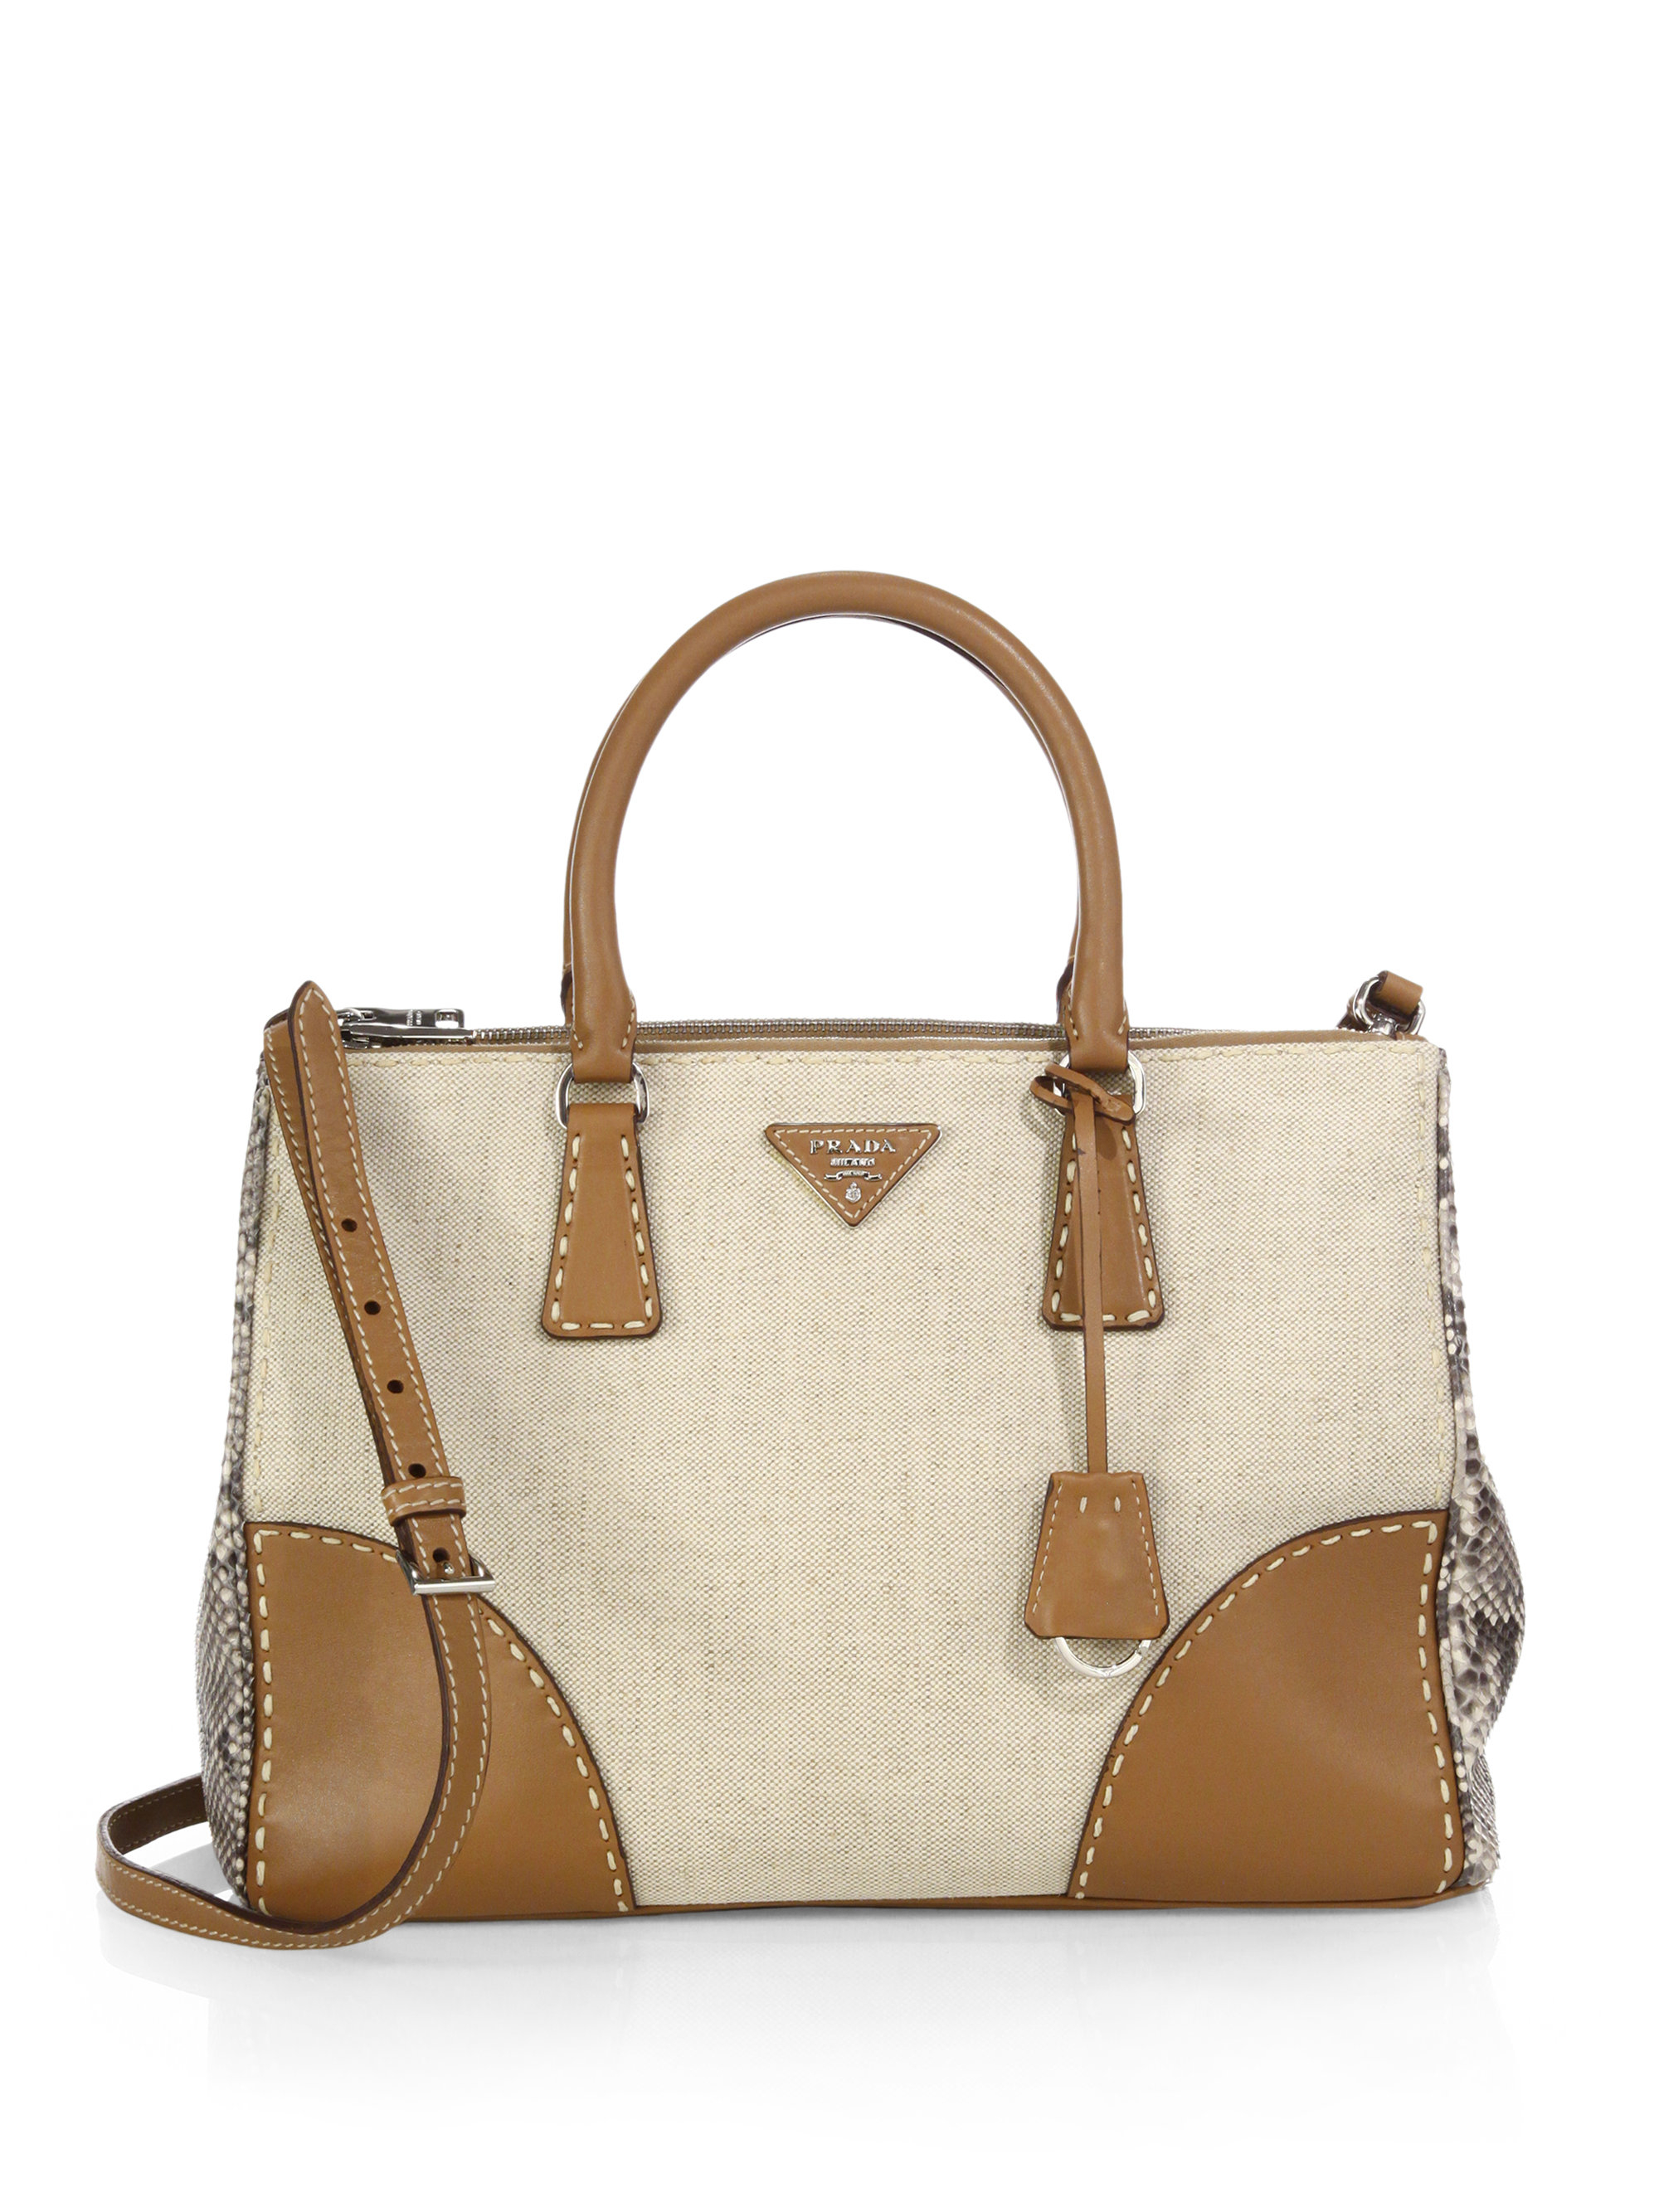 ... wholesale lyst prada canvas python double bag in brown cbd42 030ec ea81a59bbdb29